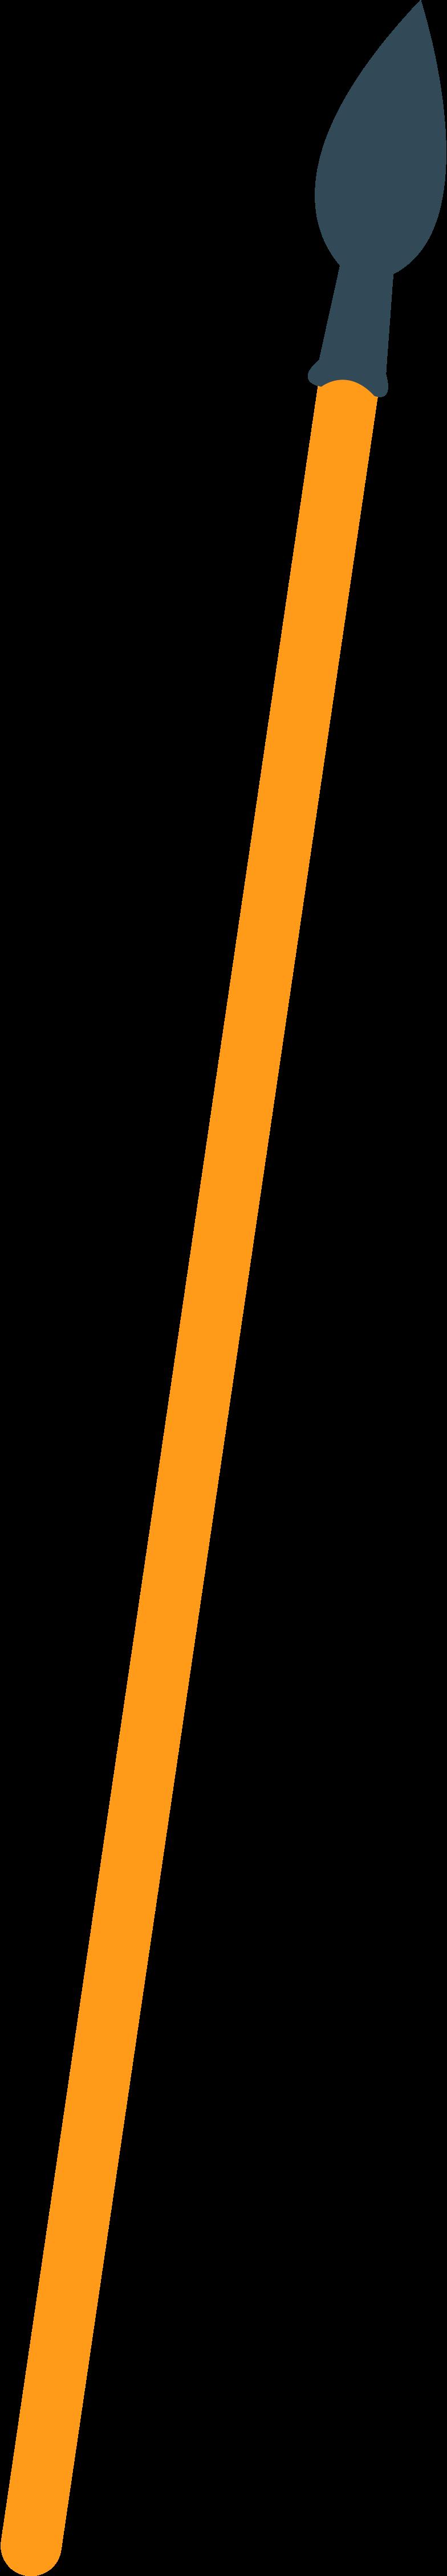 spear Clipart illustration in PNG, SVG